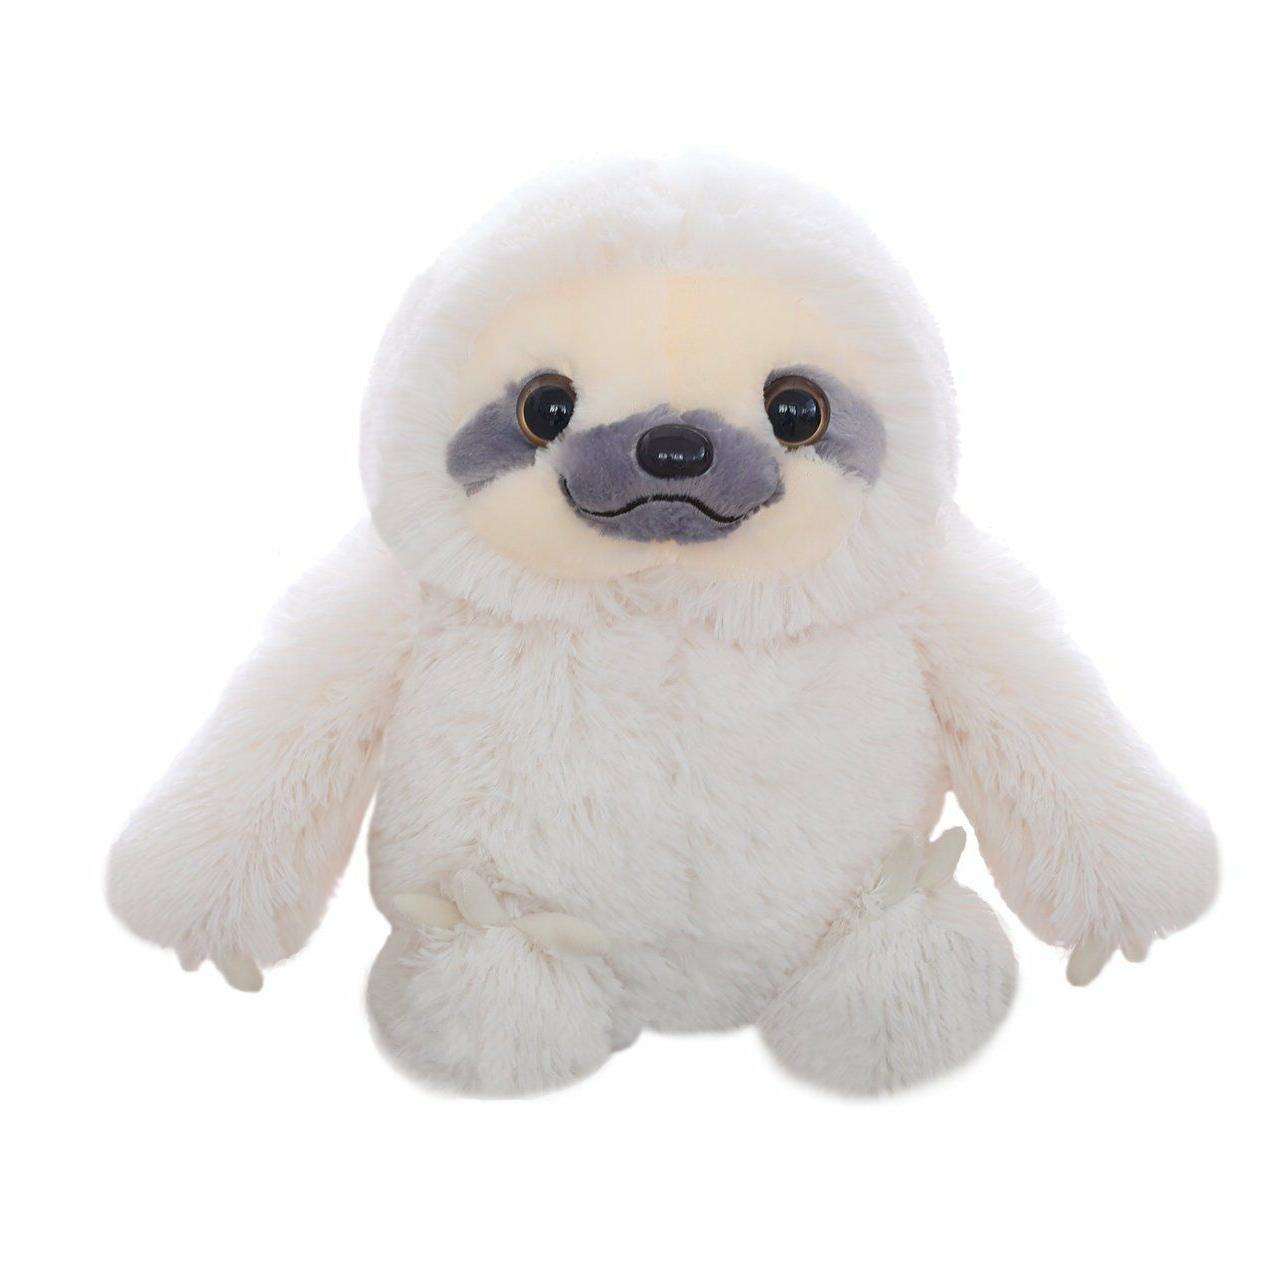 Winsterch Kids Sloth Bear Stuffed Animal Plush Toy White, 15